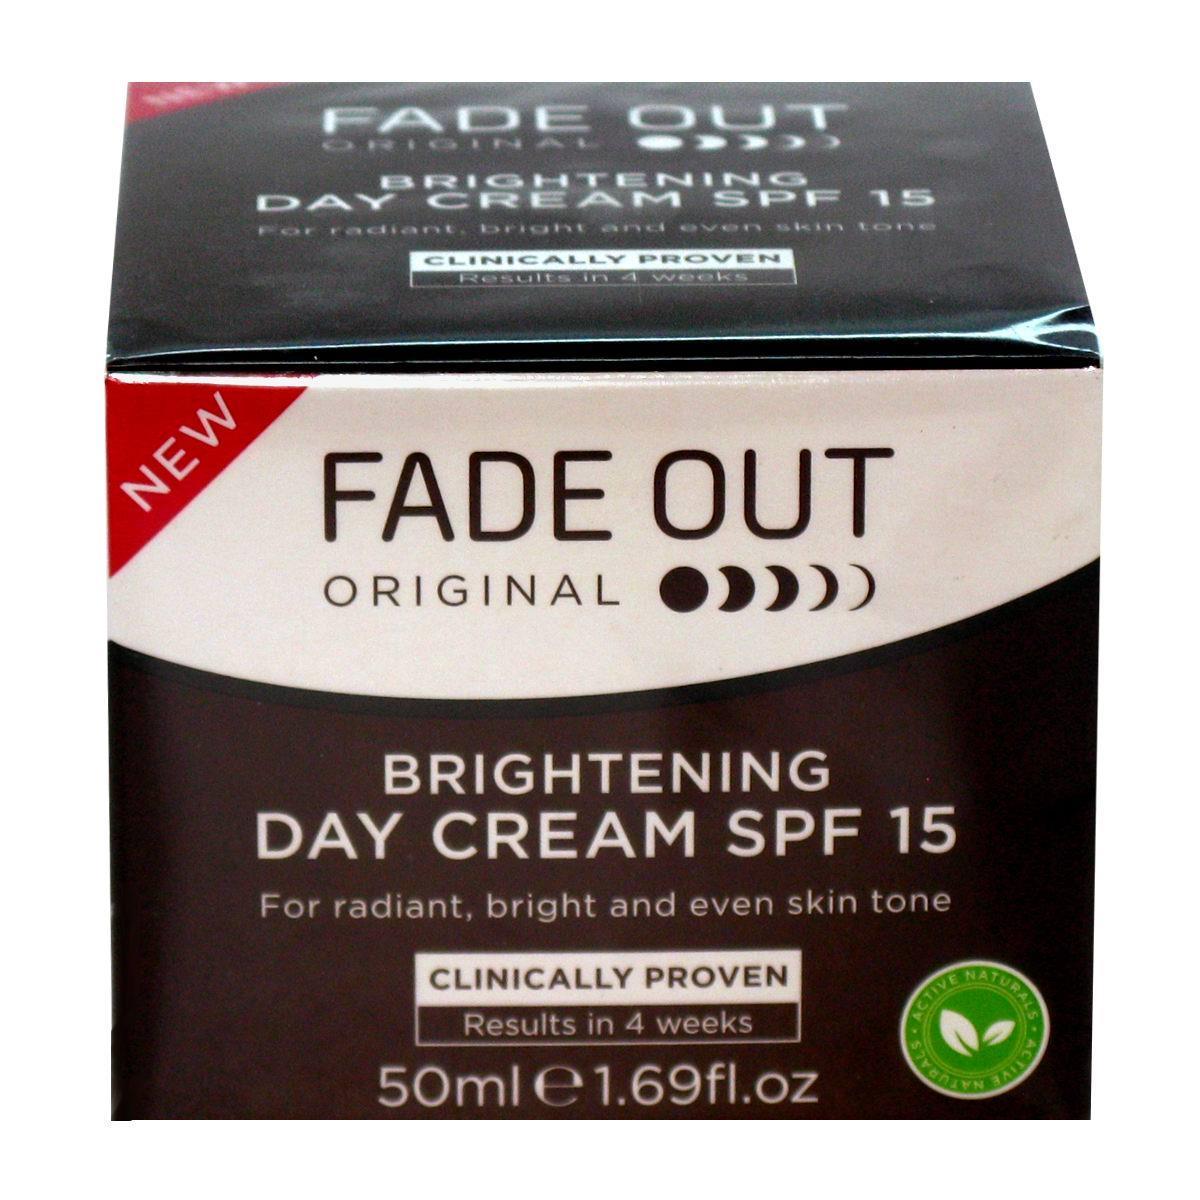 Fade Out Original Brightening Gündüz Kremi Spf 15-50 ml